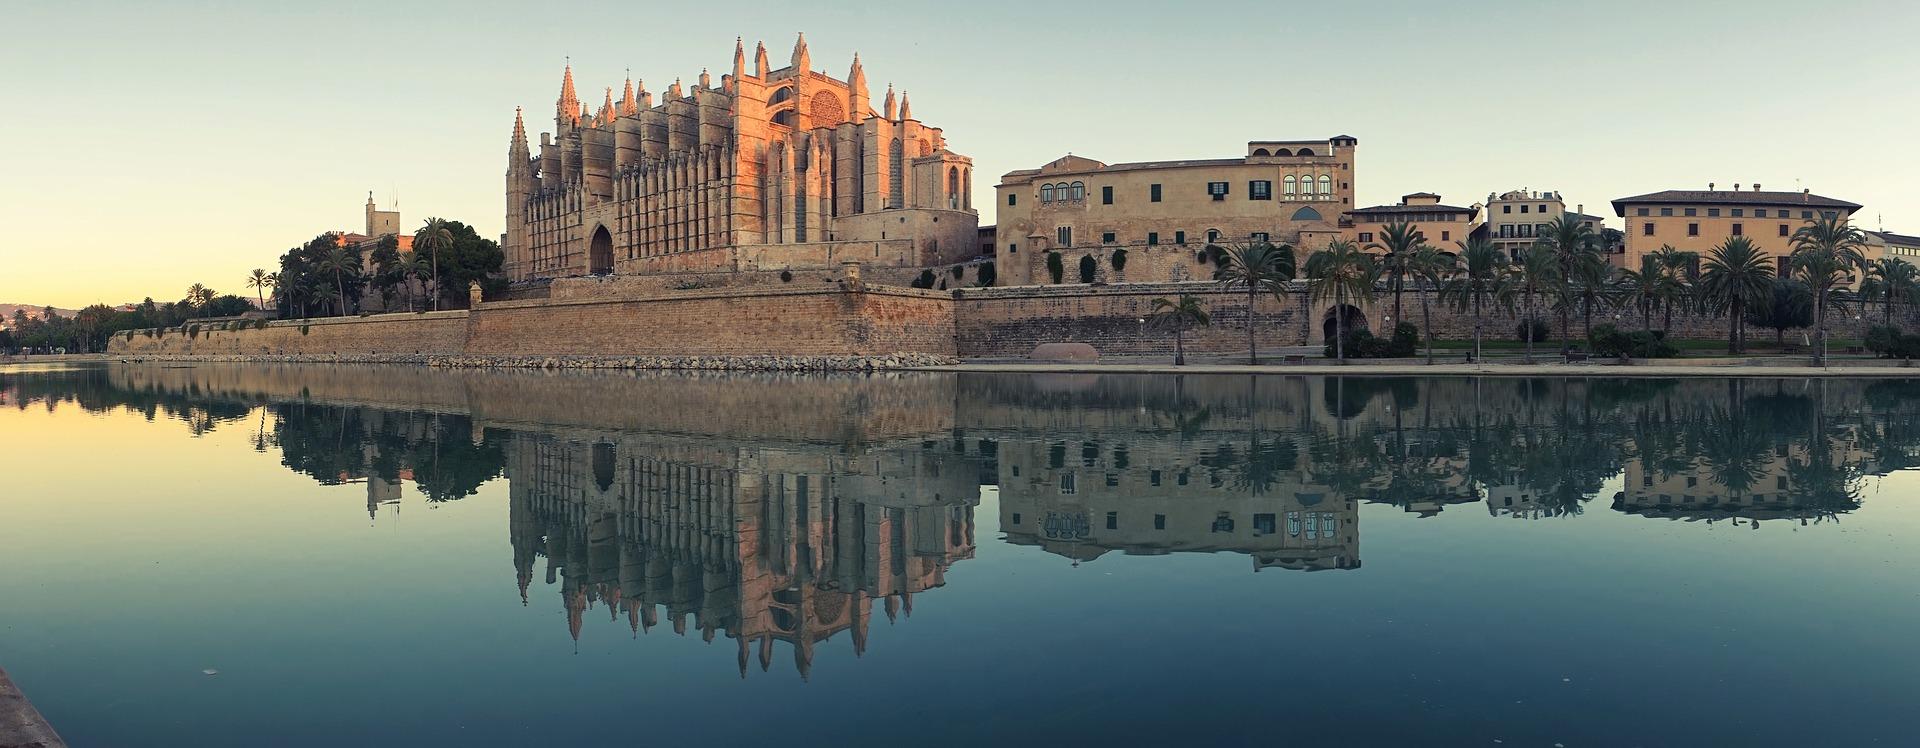 Visita a la catedral de Palma